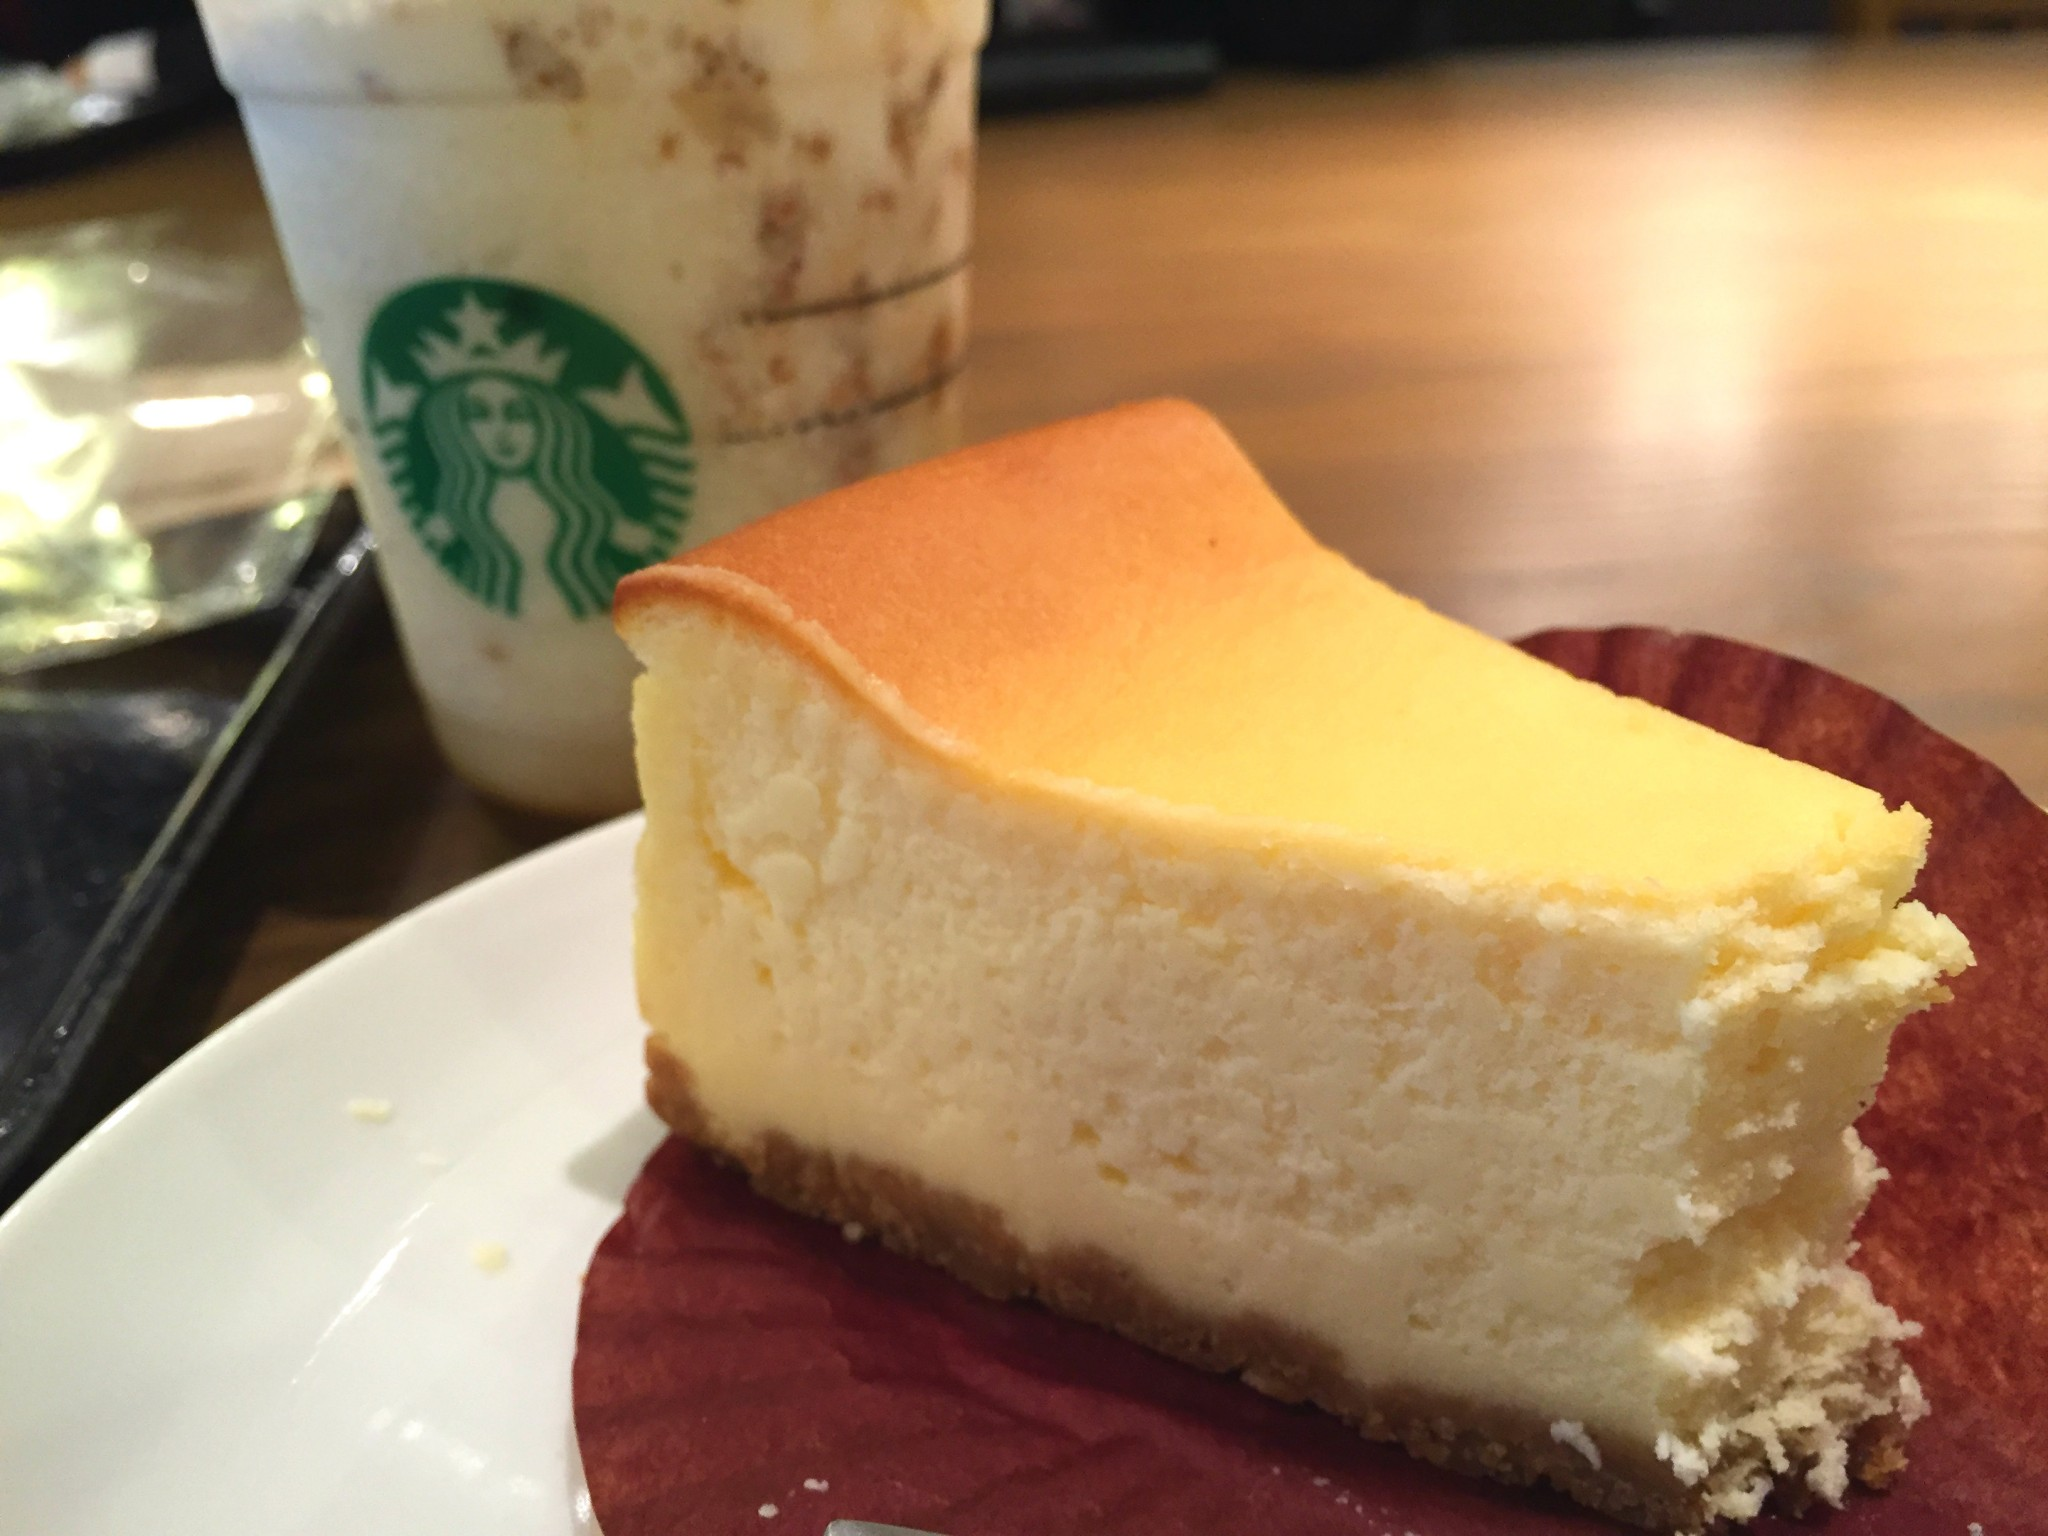 Tokion ruokapaikat Starbucks cheesecake